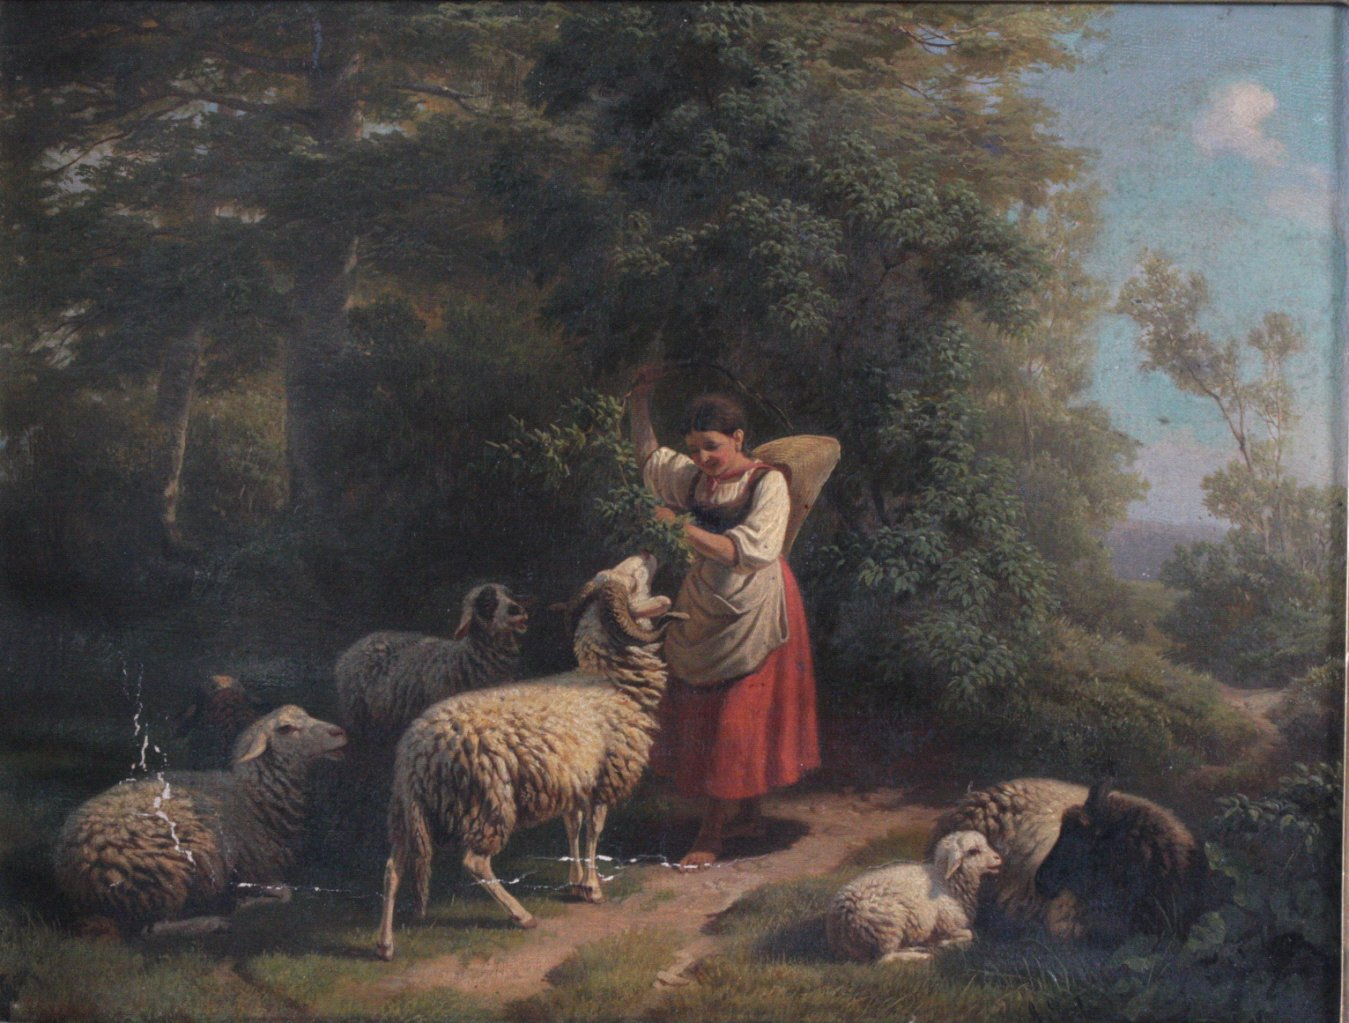 Robert Eberle, 1815-1860-1